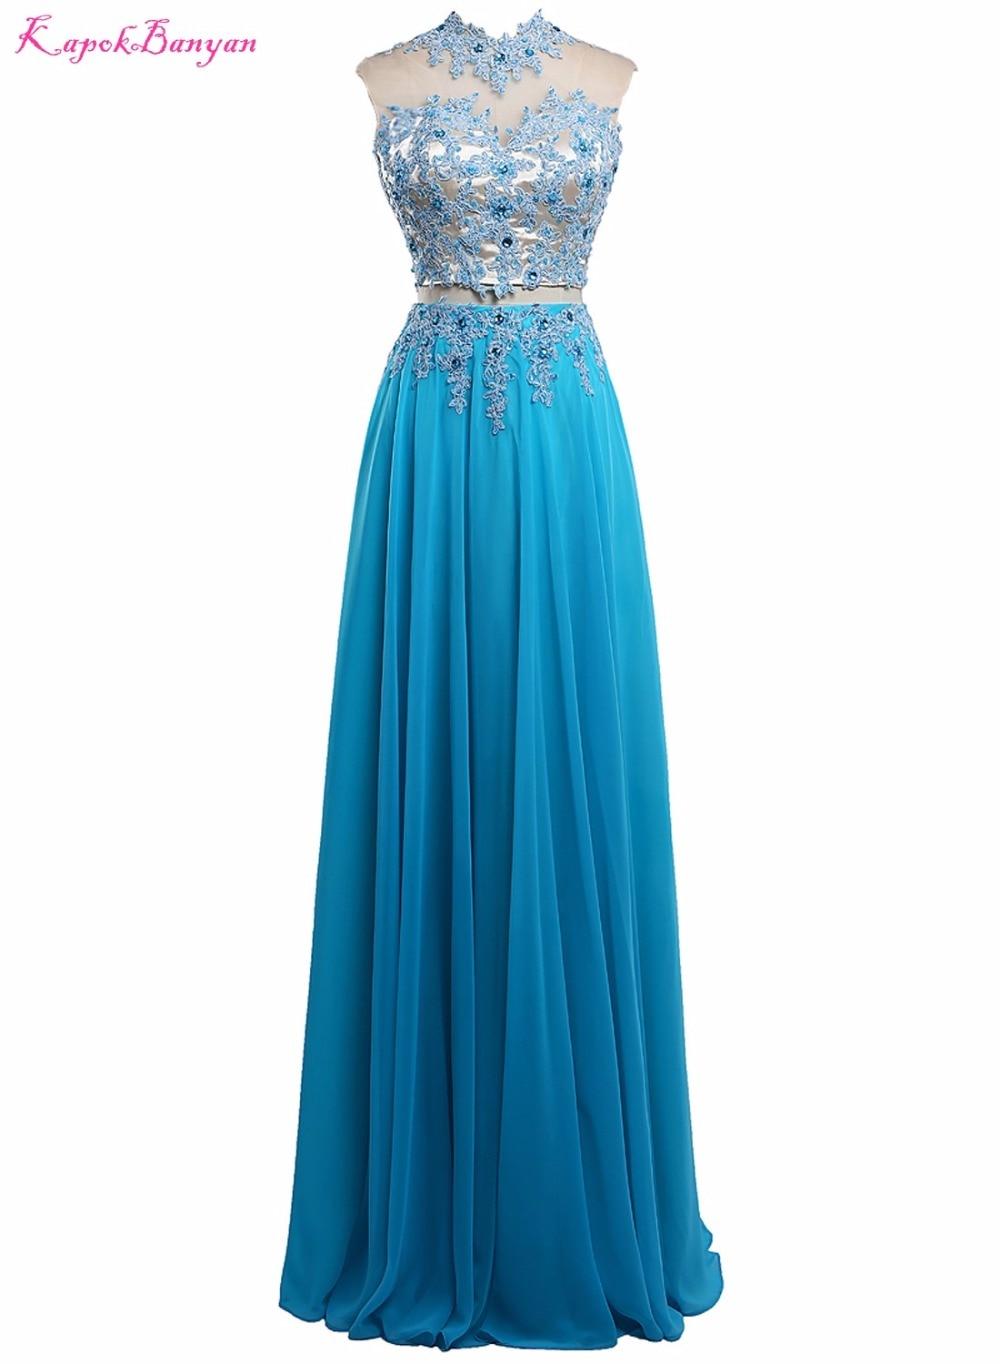 Bridalaffair Real Photo Two Piece Blue Chiffon Appliques   Prom     Dresses   2017 Sleeveless High Neck Long Party Gown Vestido de festa